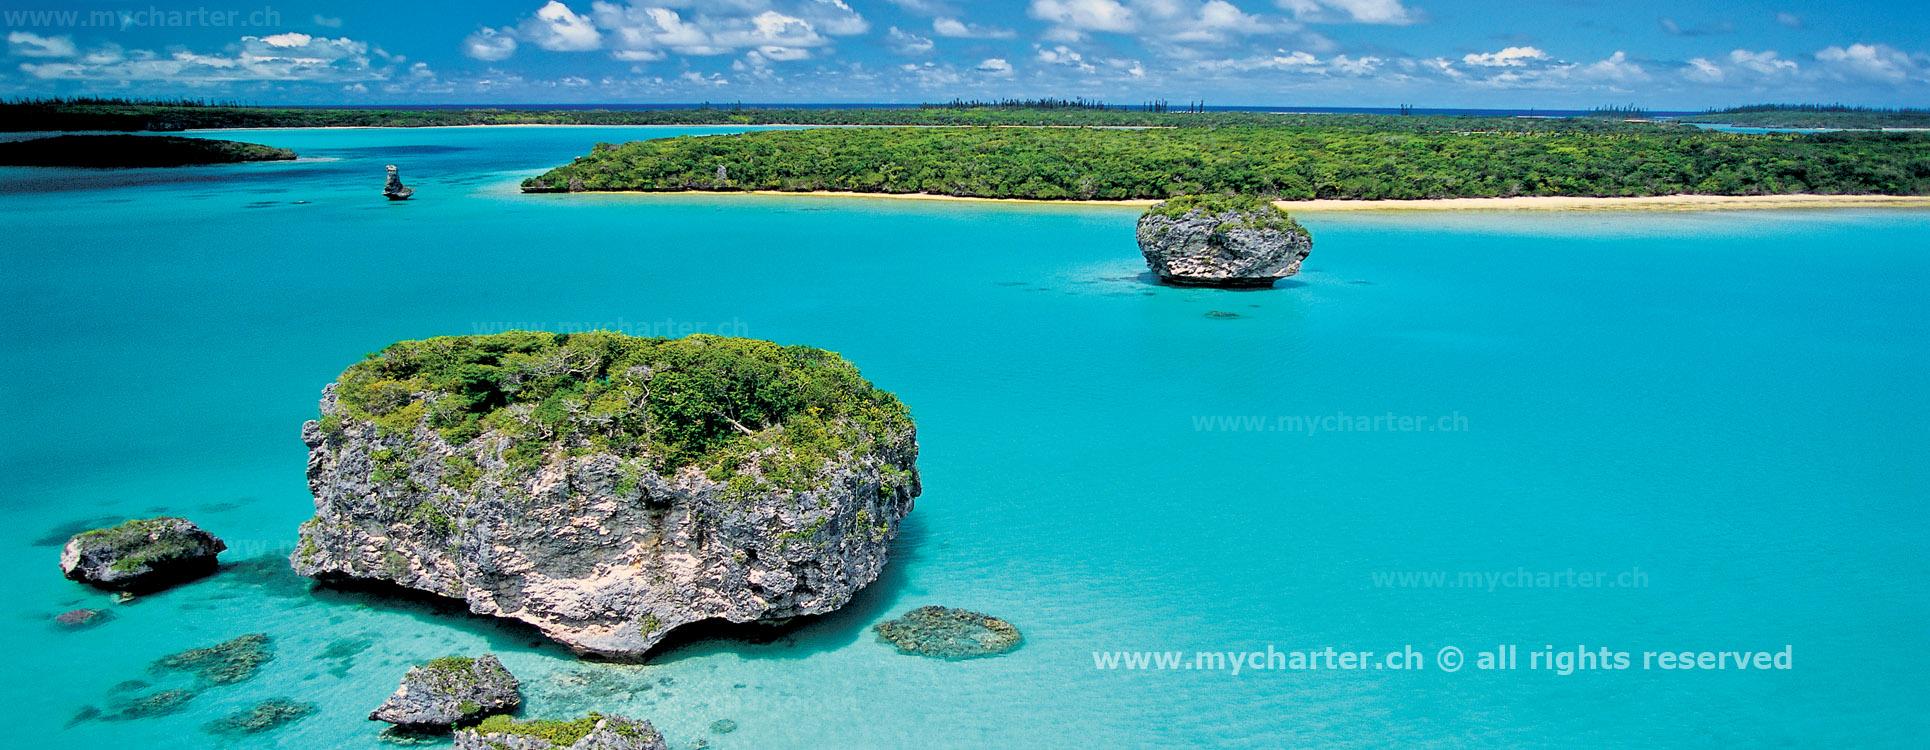 Neukaledonien - Baie d'Upi